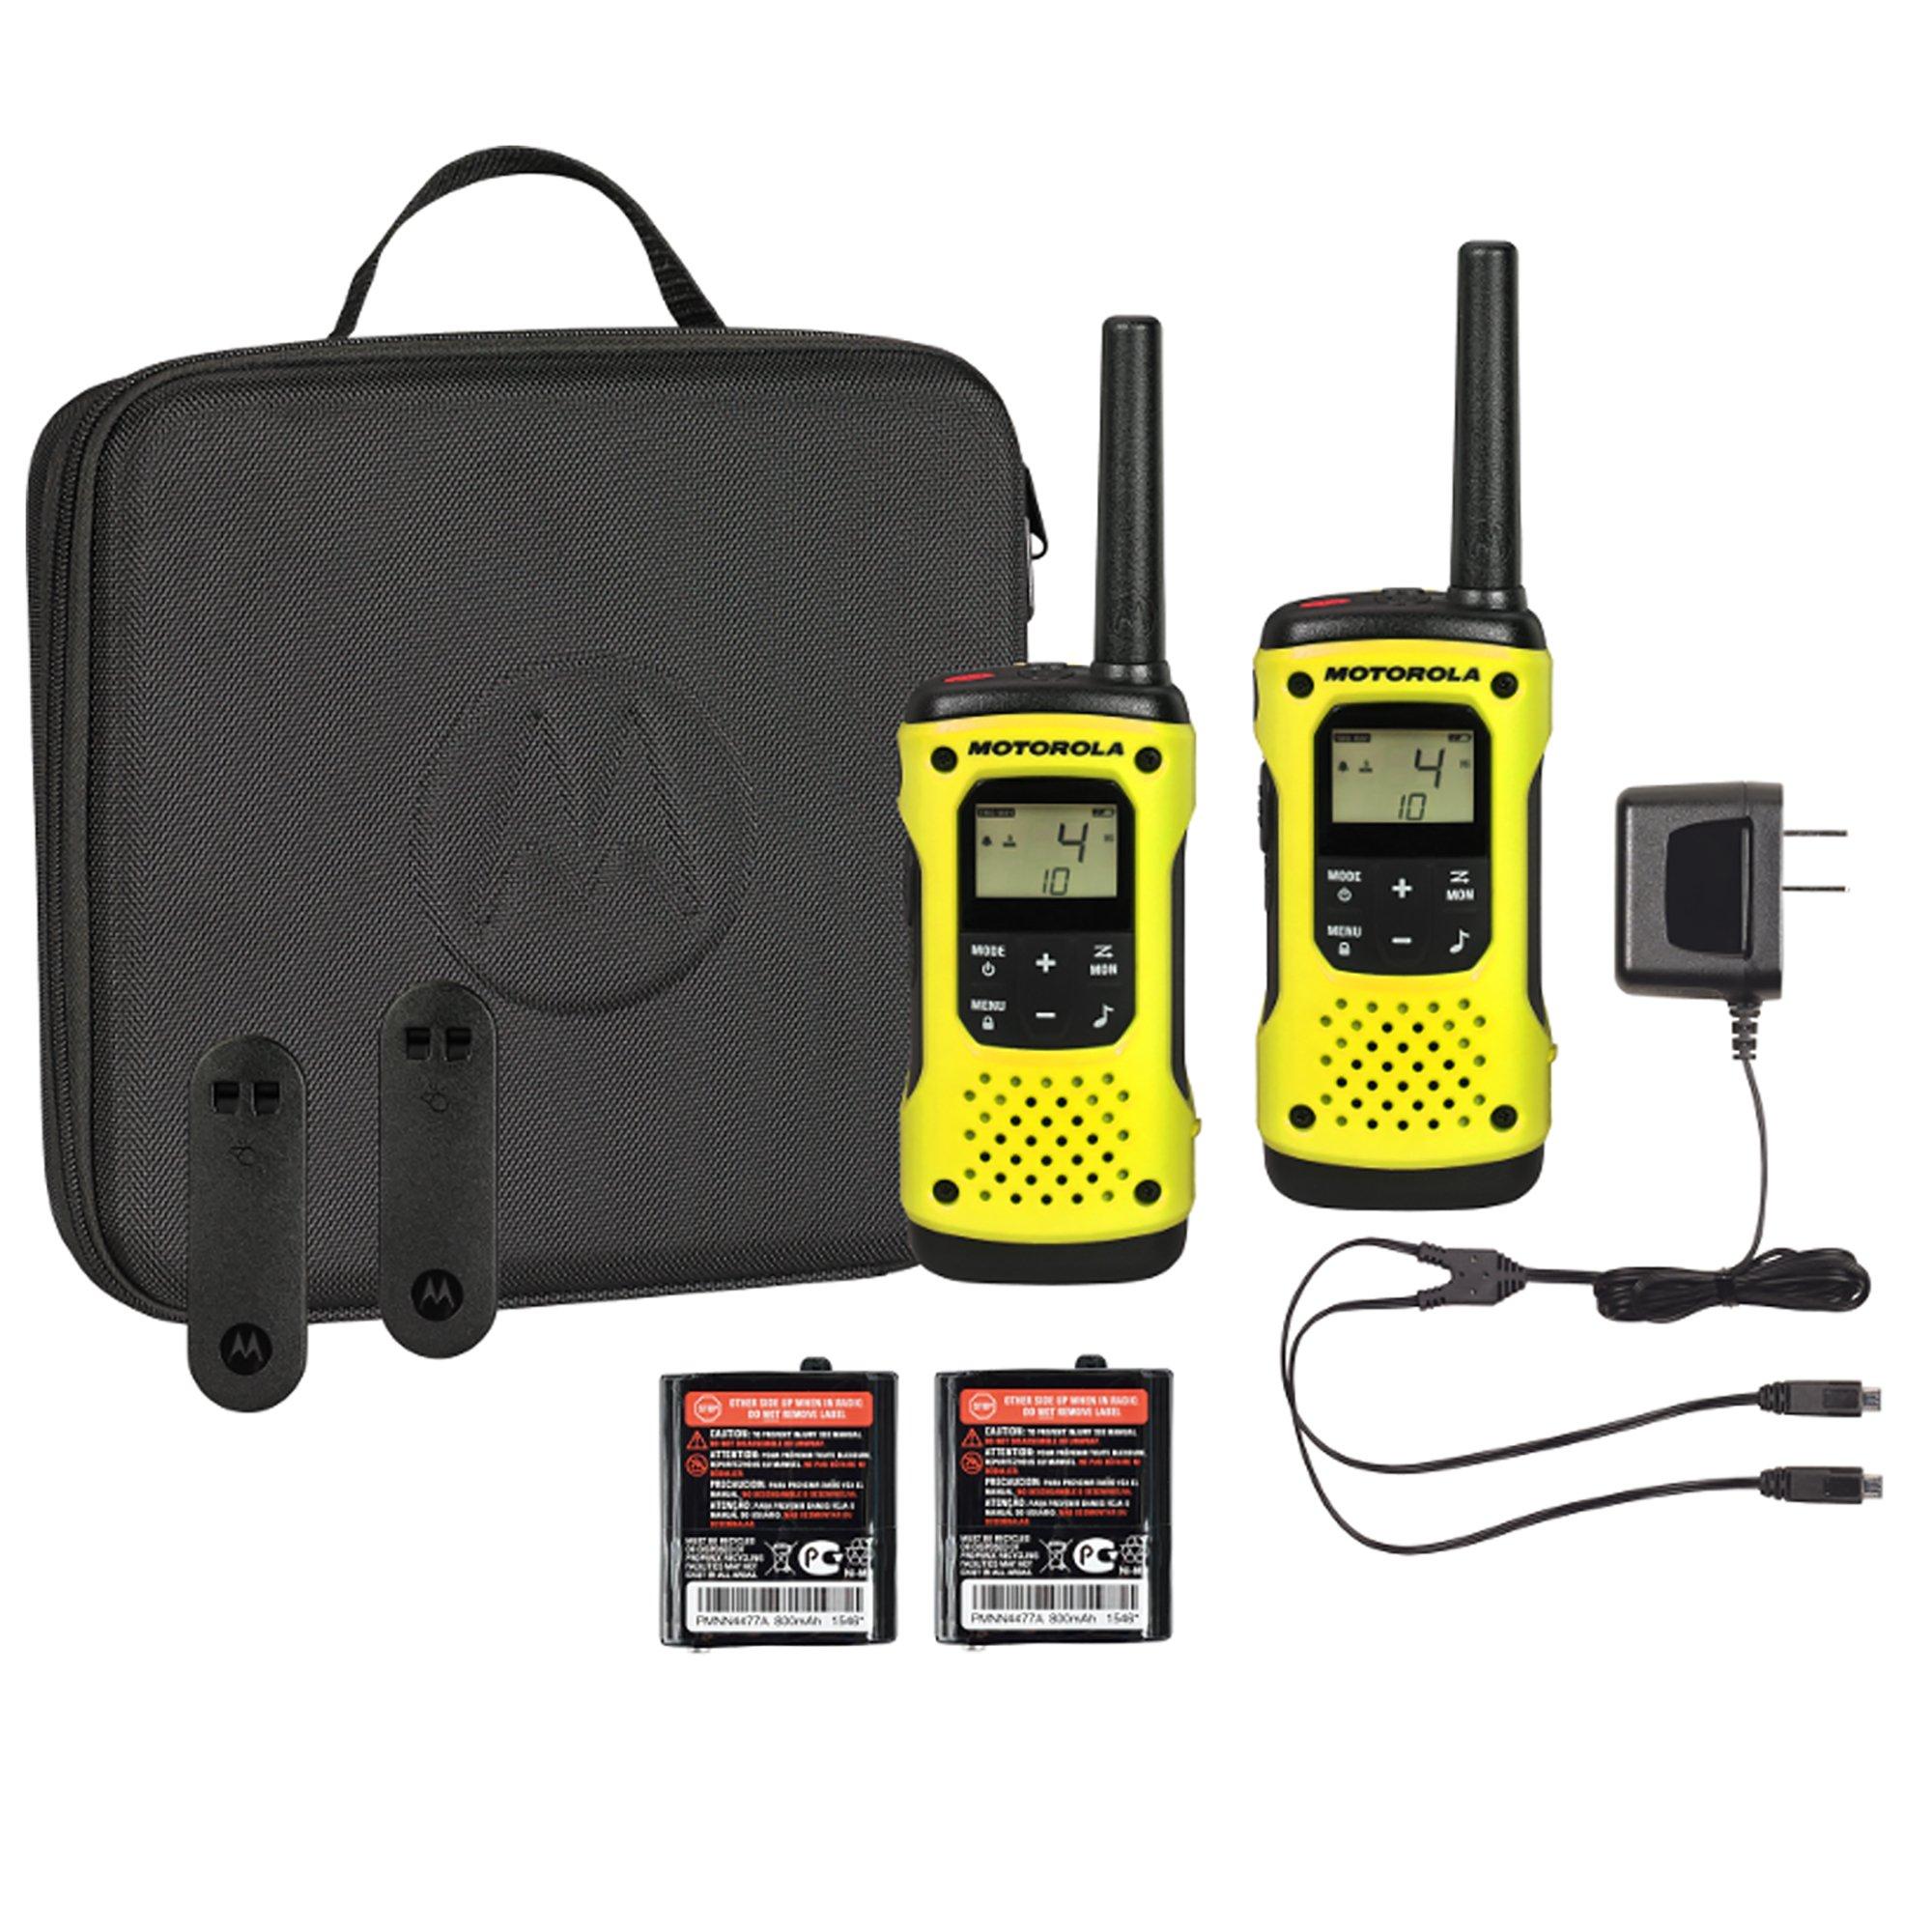 Motorola Talkabout Radio T631 by Motorola Solutions (Image #1)